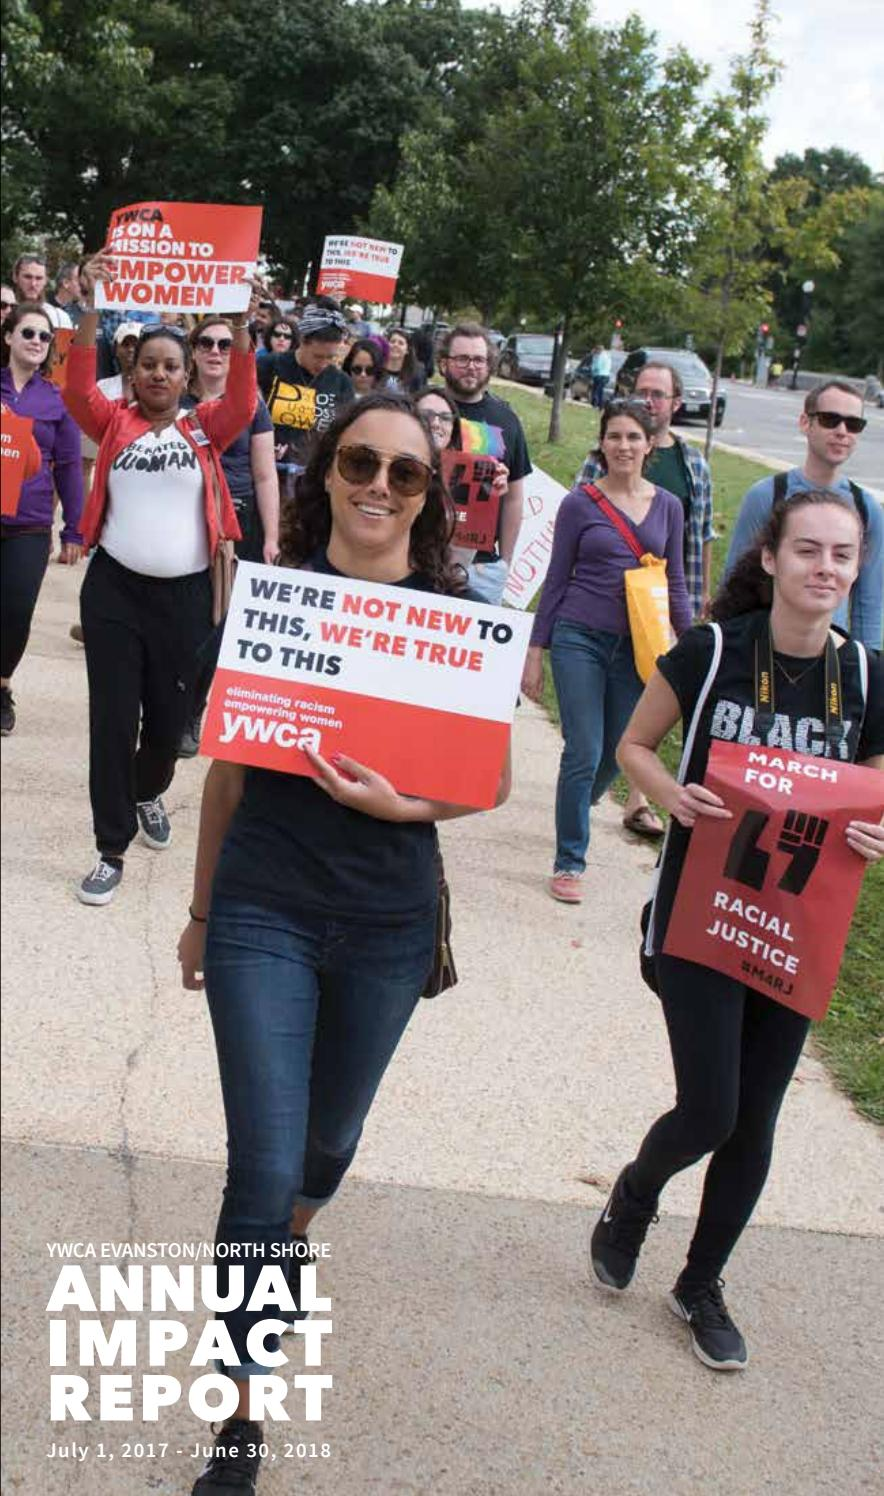 2018 Annual Impact Report by YWCA Evanston/North Shore - issuu